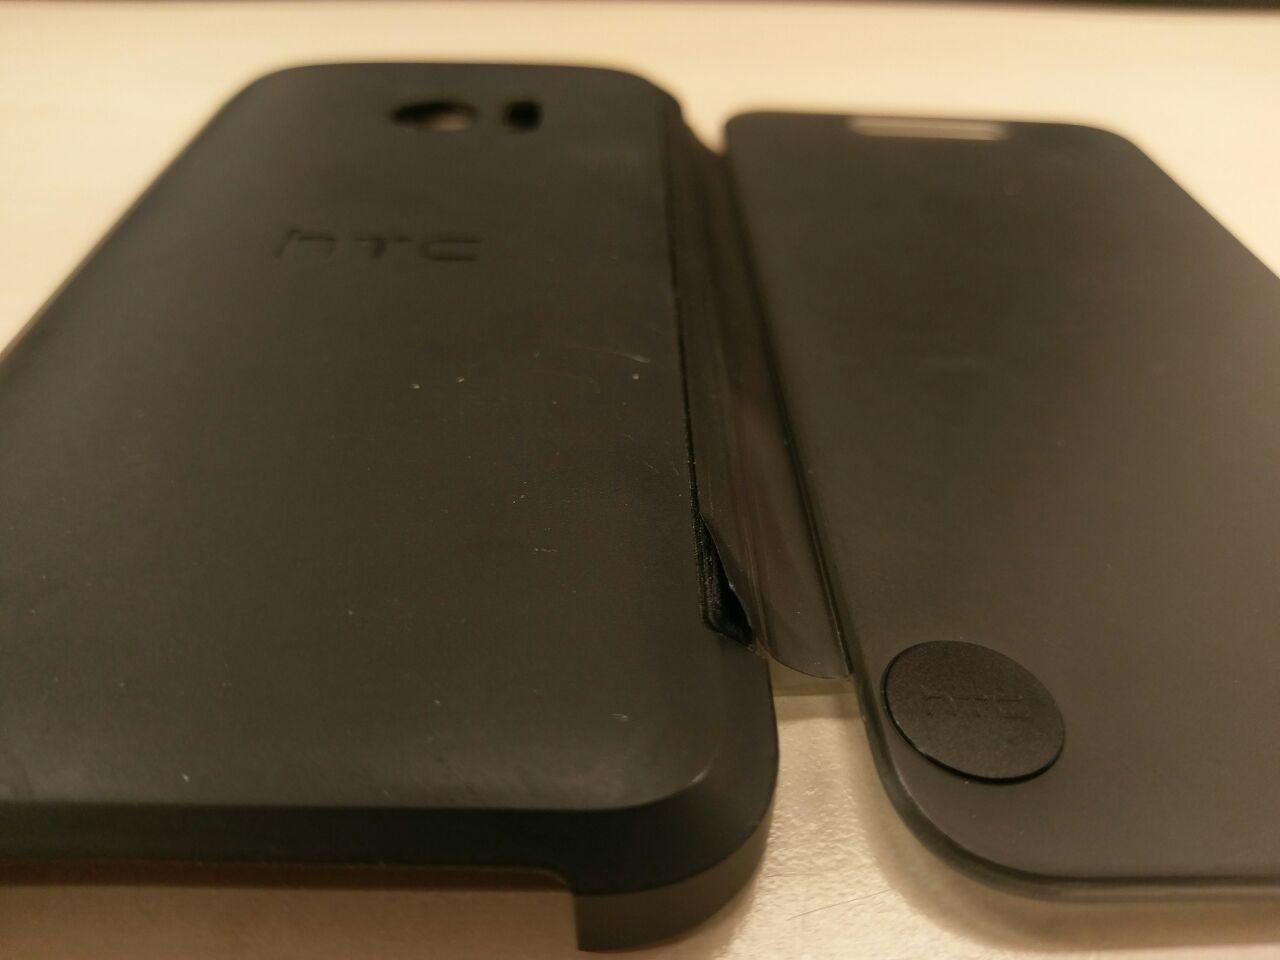 cheaper d5b39 87820 HTC 10 Ice View Case (HTC 10) Zwart - Frankcoef - Userreviews - Tweakers